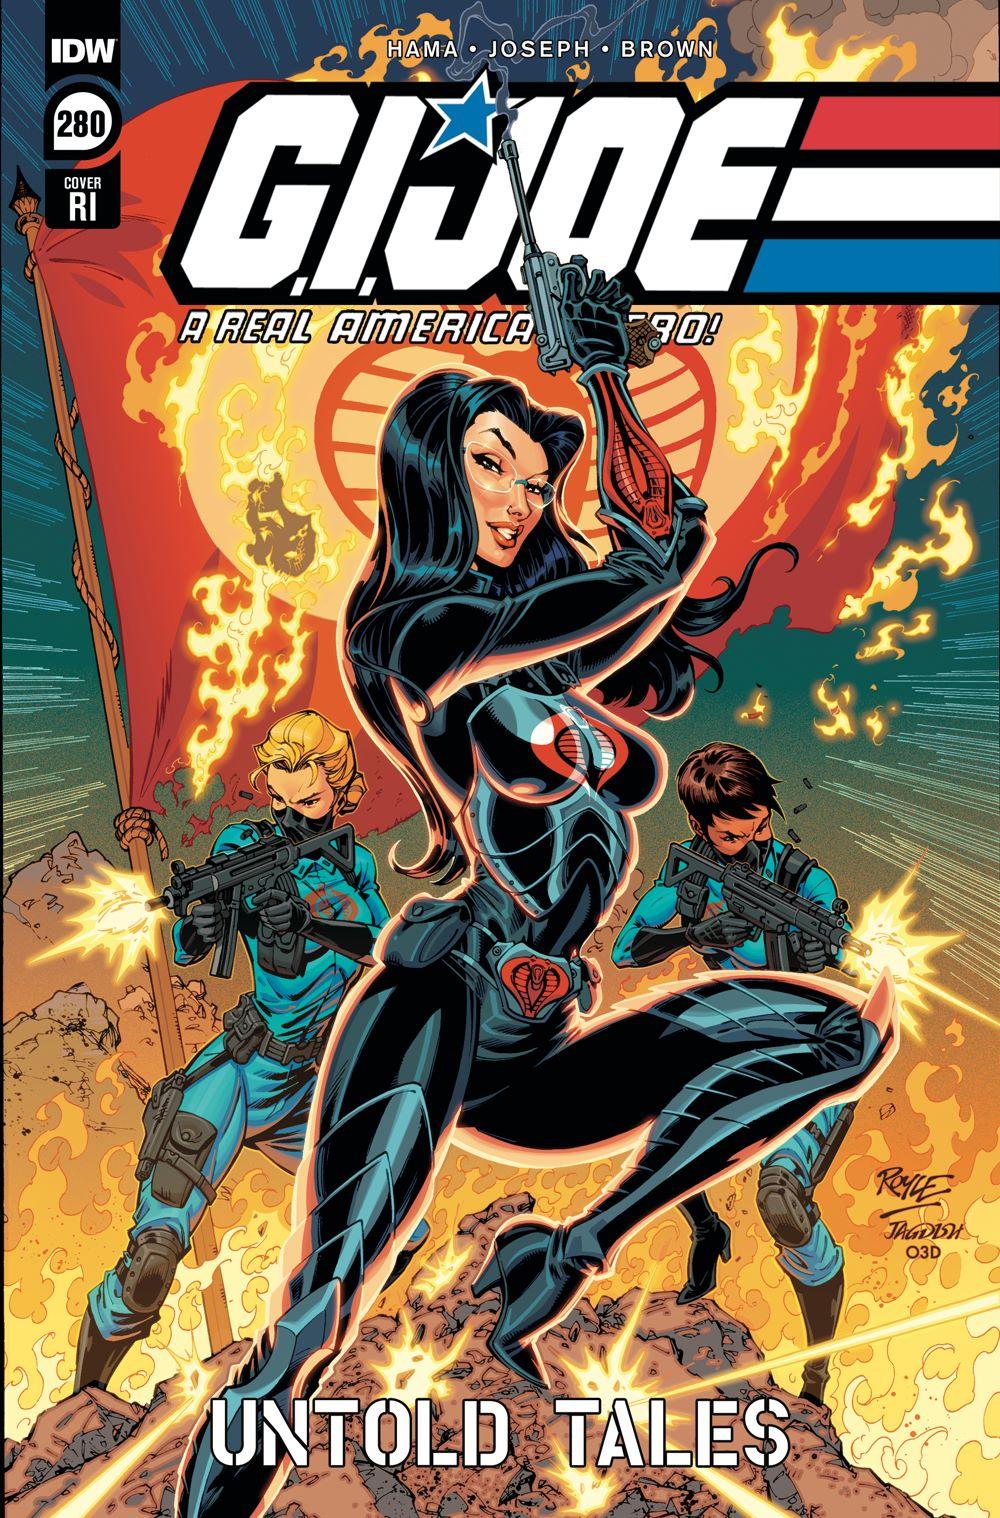 GIJoeRAH280-coverRI ComicList Previews: G.I. JOE A REAL AMERICAN HERO #280